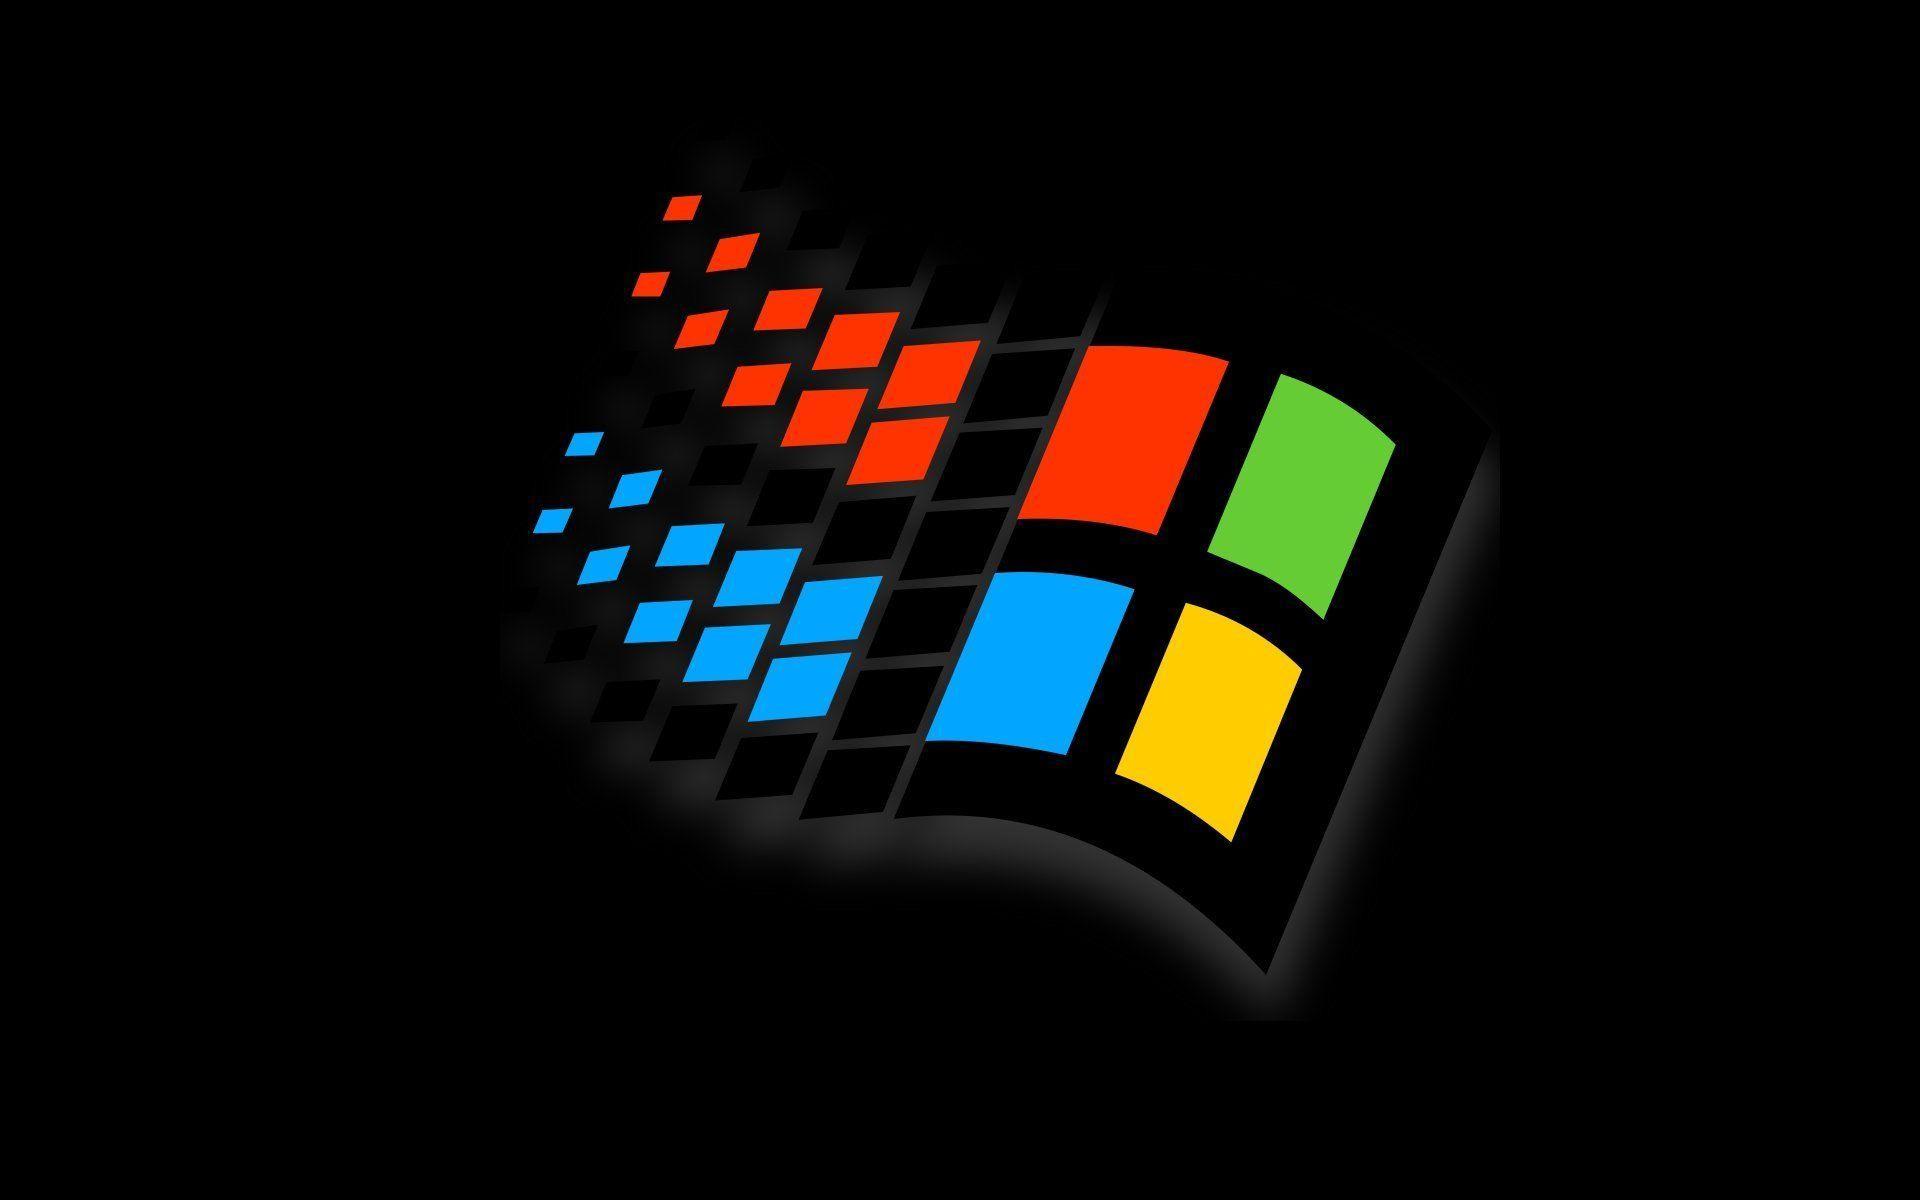 Original Windows 95 Wallpaper (58+ images)